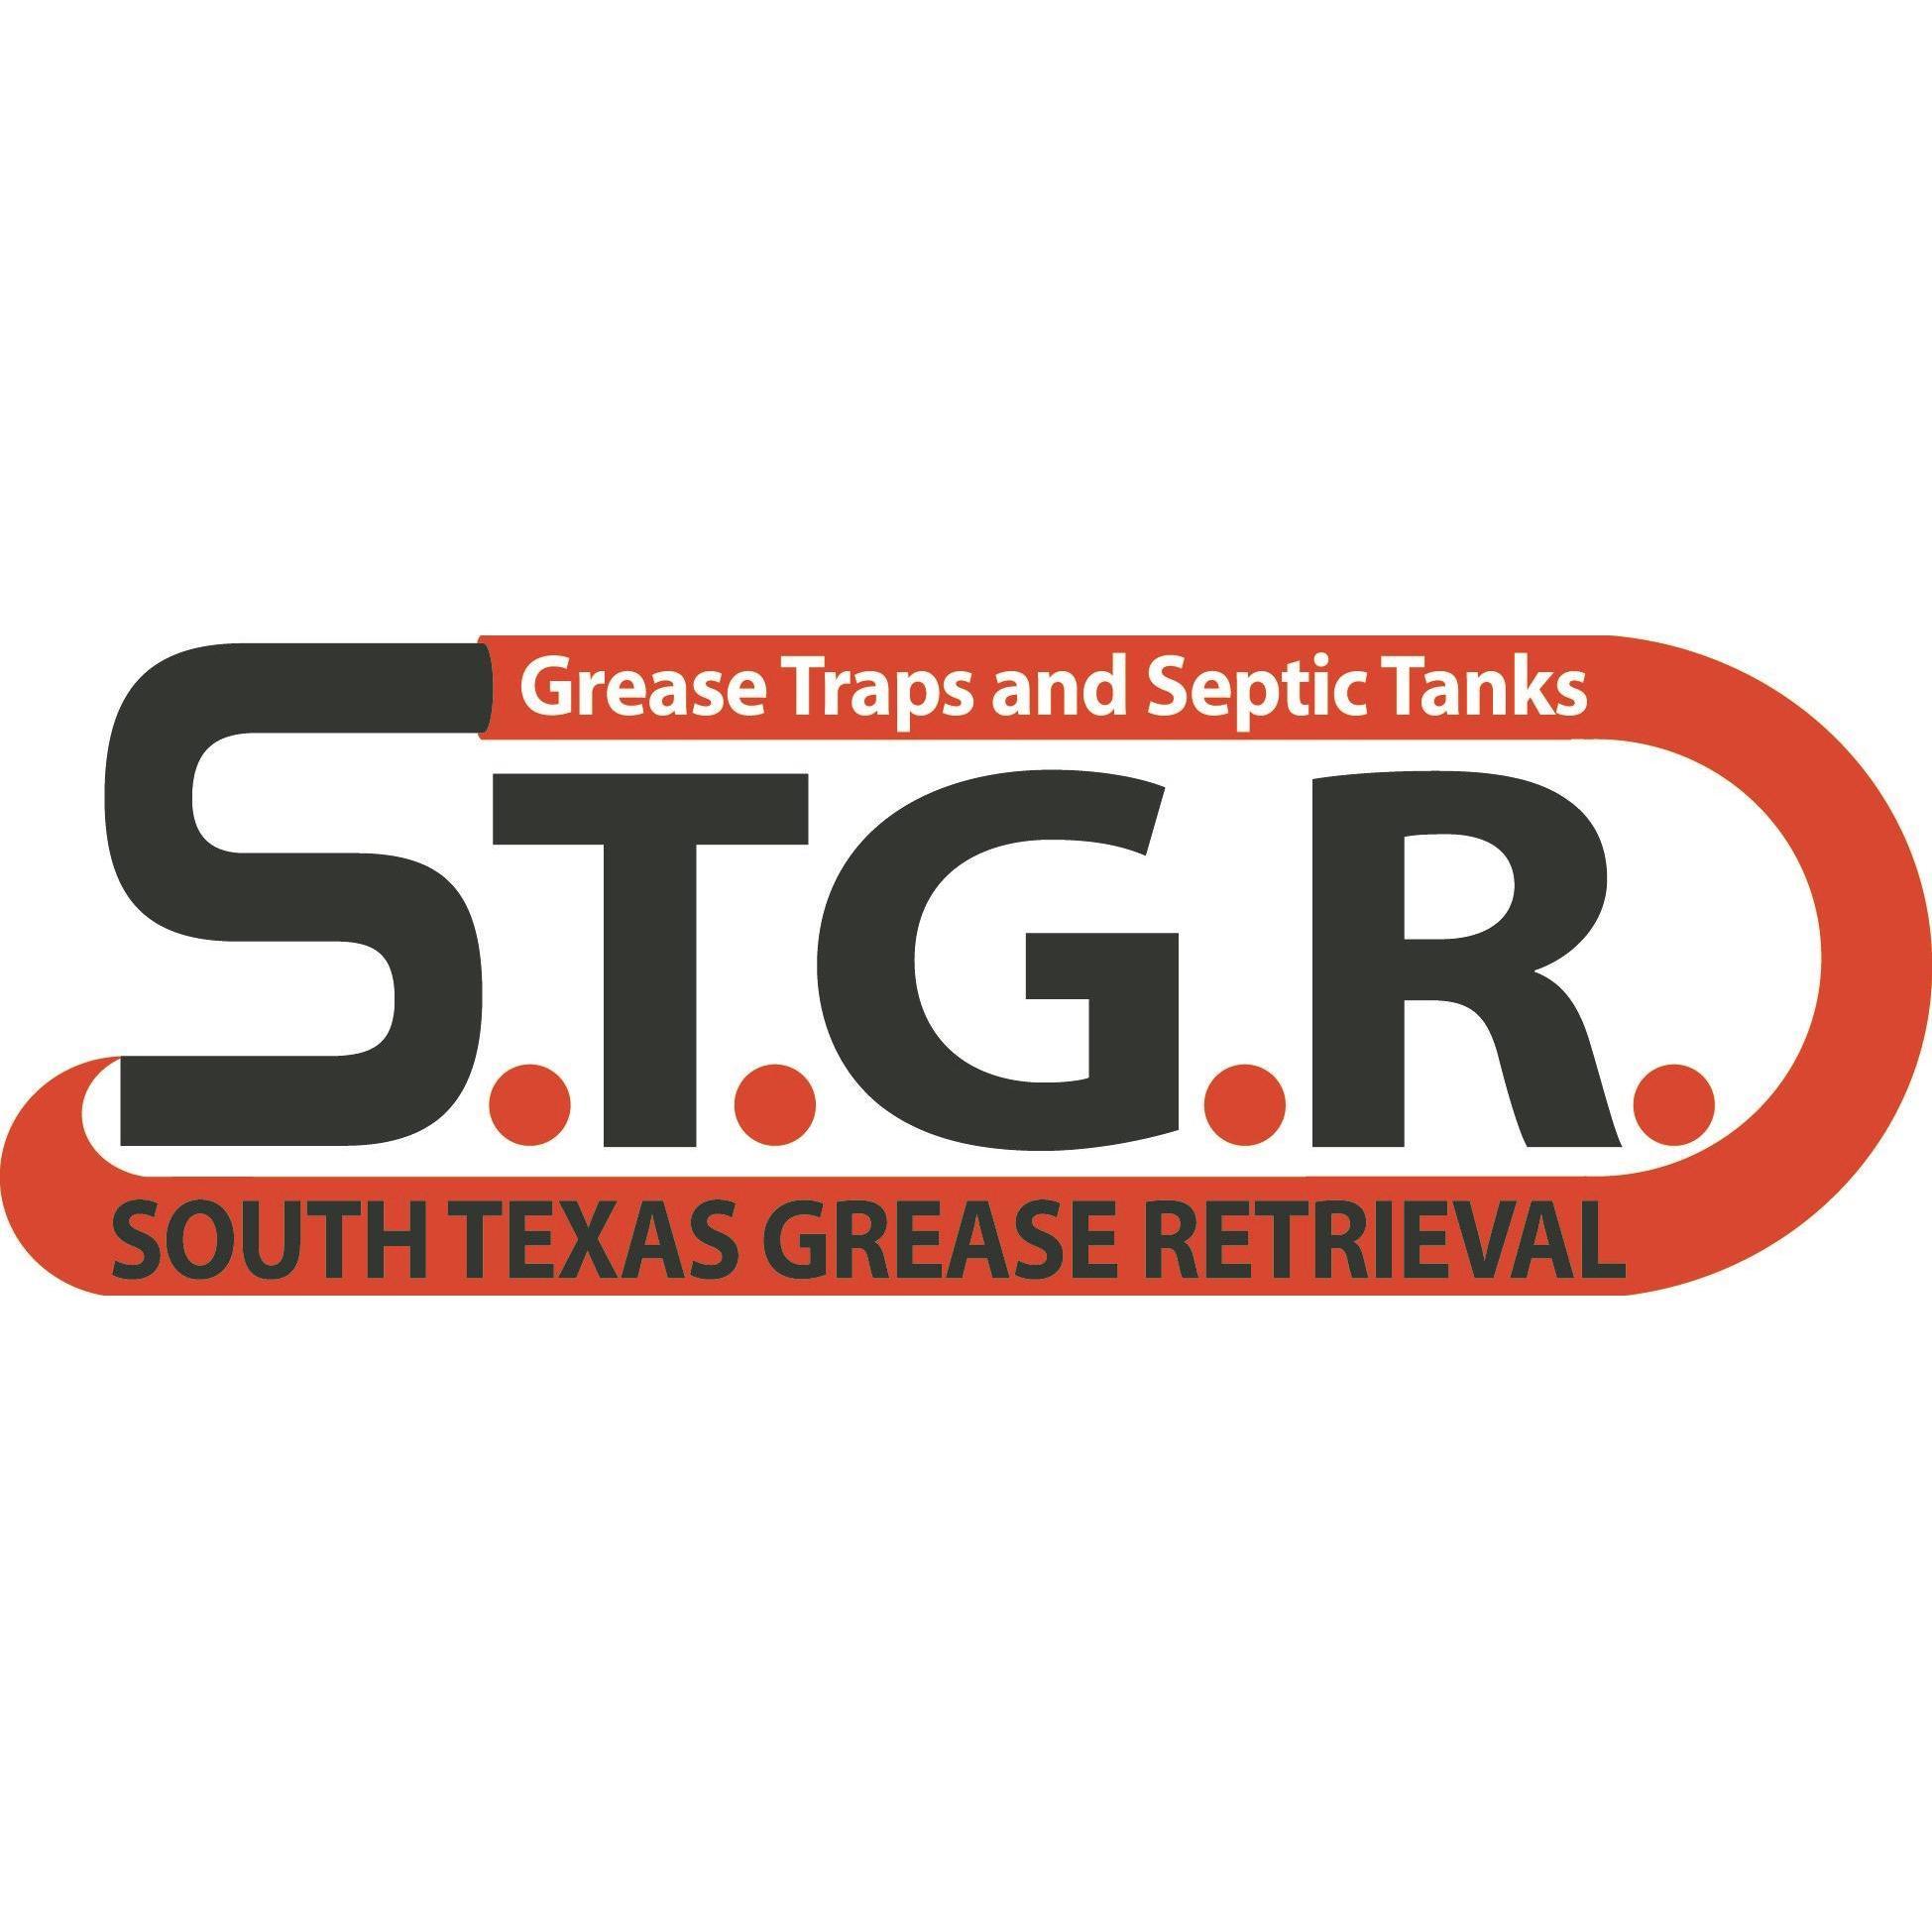 South Texas Grease Retrieval llc.